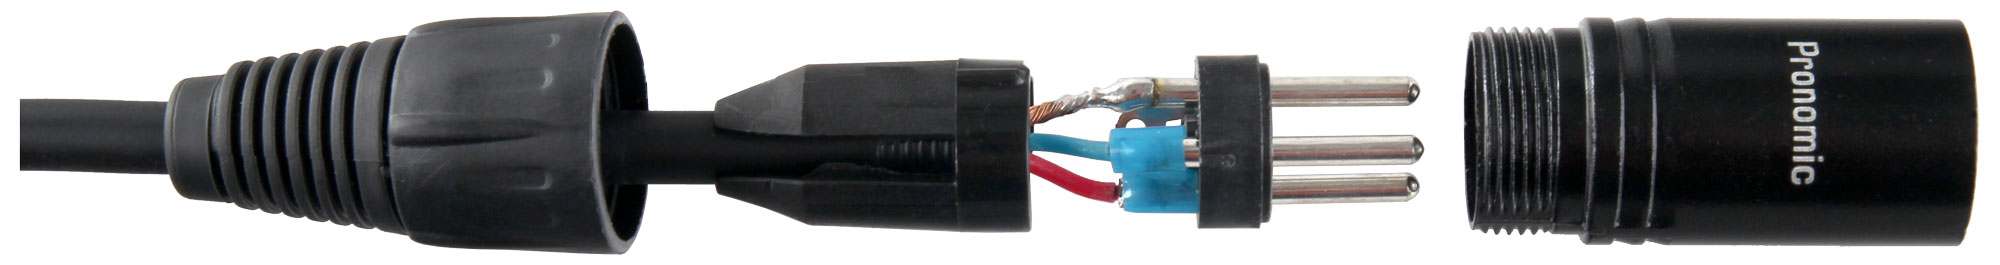 Microphone Cords Accessories : Pronomic stage xfxm microphone cable xlr m black